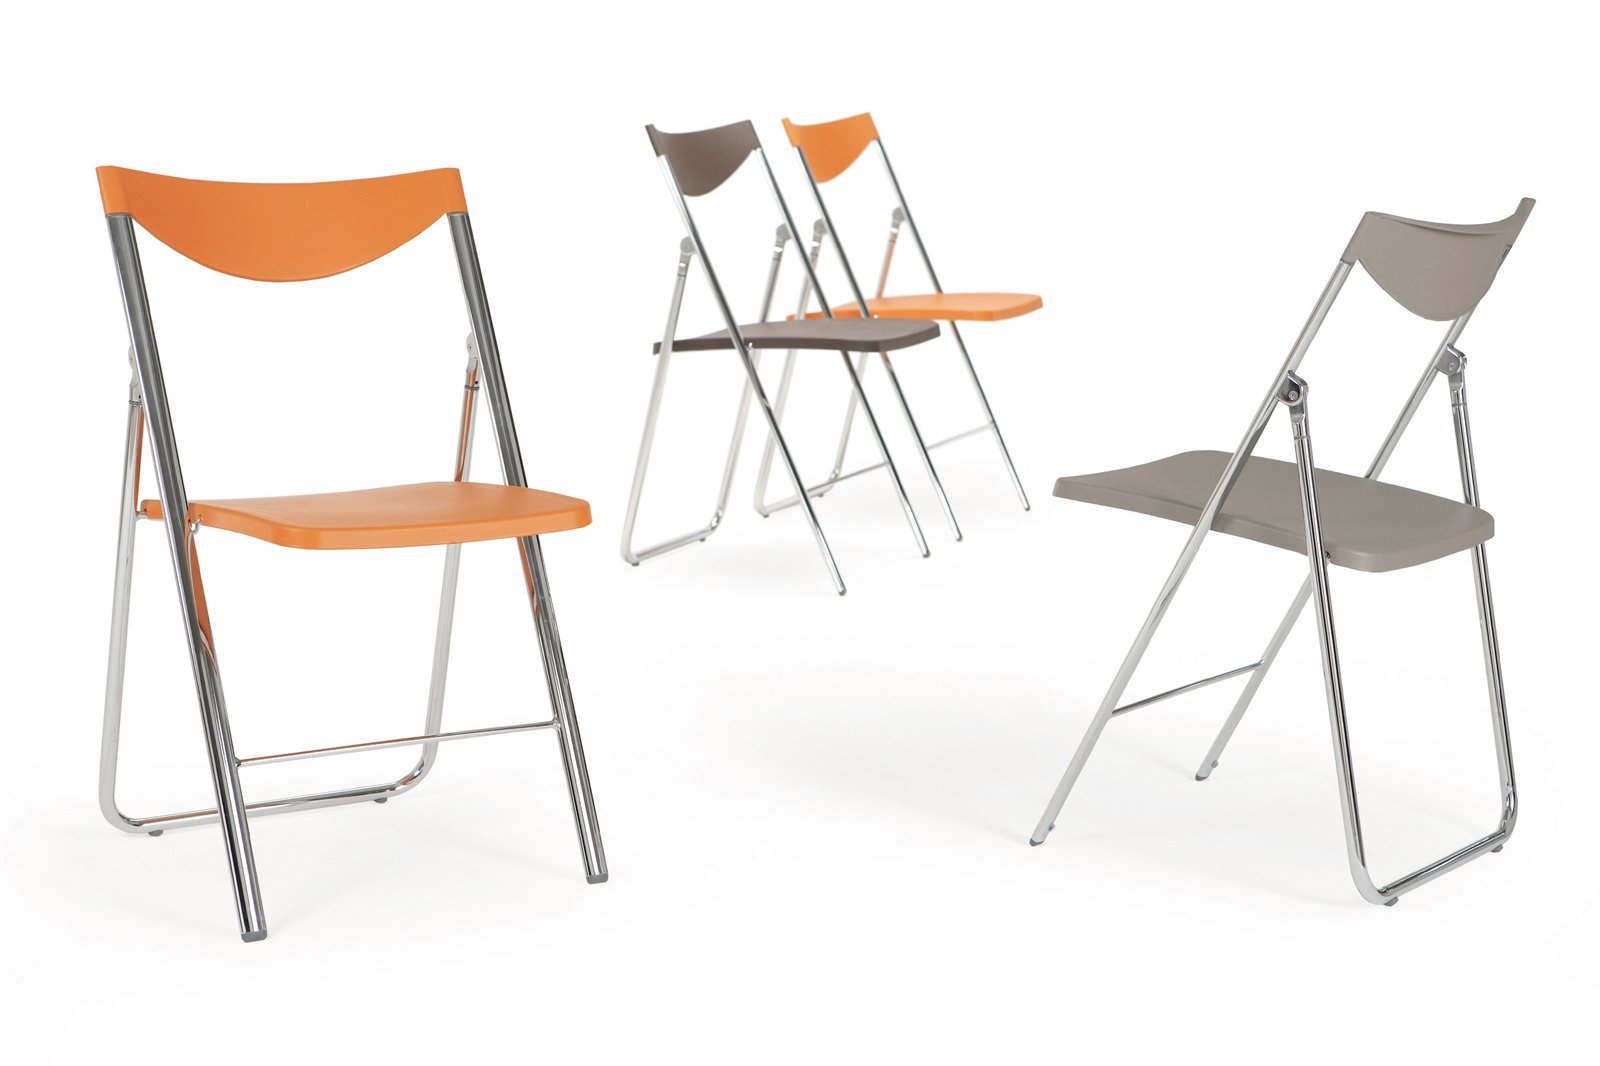 Posti O Il Pratico Gancio Da Parete Per 4 Sedie. Www.ozzio.com #B1551A 1600 1066 Sedie X Cucina Ikea